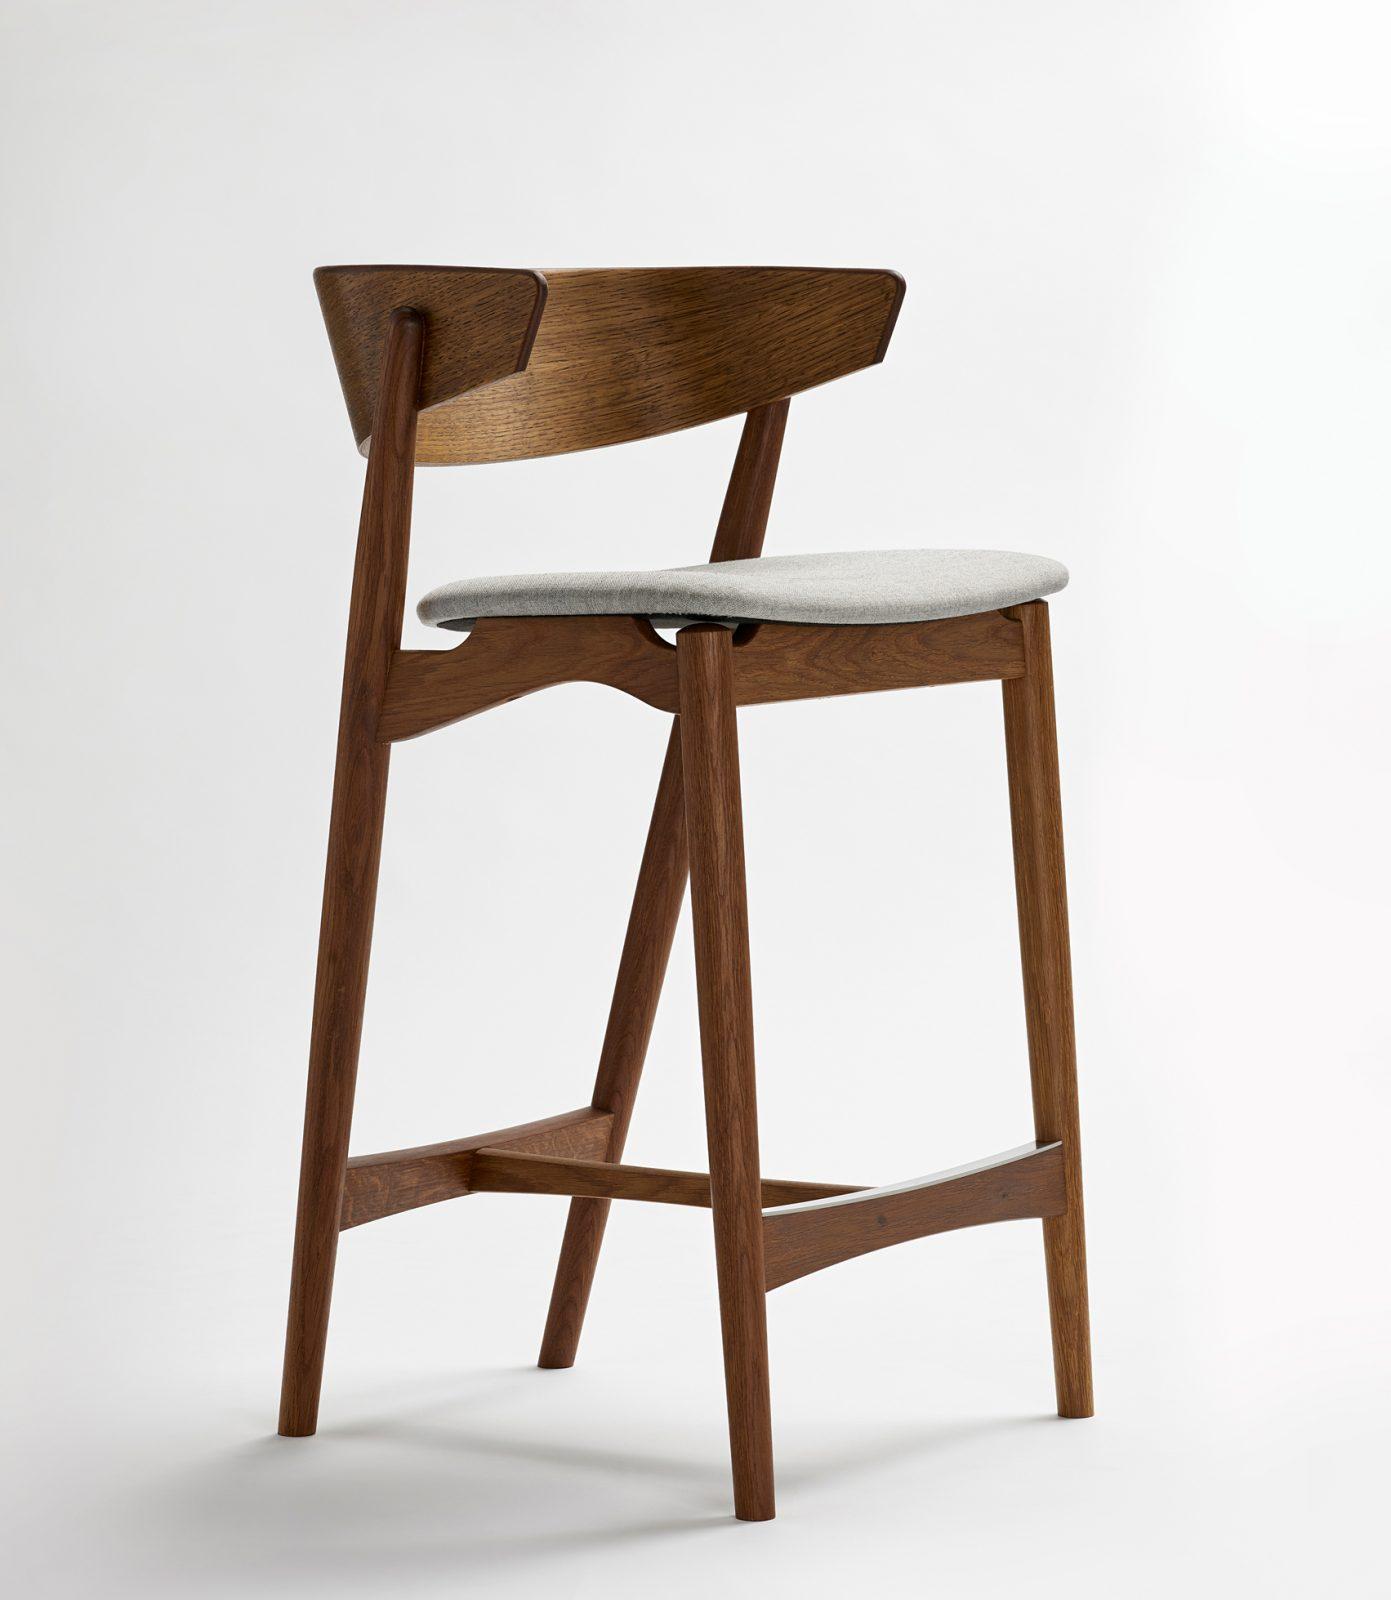 Sibast Furniture - SIBAST No 7 Barstuhl